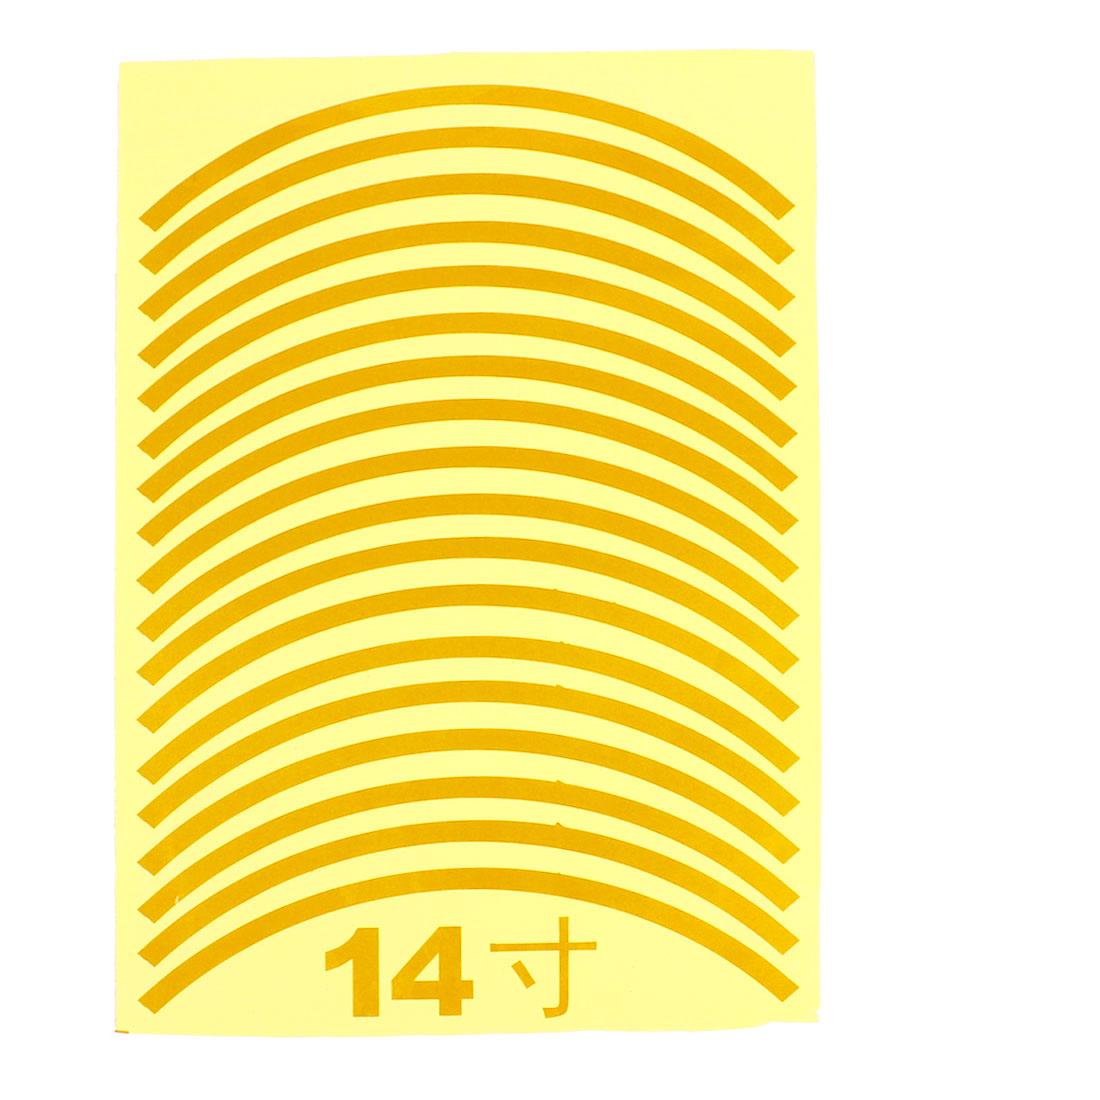 "18pcs 29.5cm Length Car Van Tire Rim Gold Tone Decorative Sticker for 14"" Wheels"